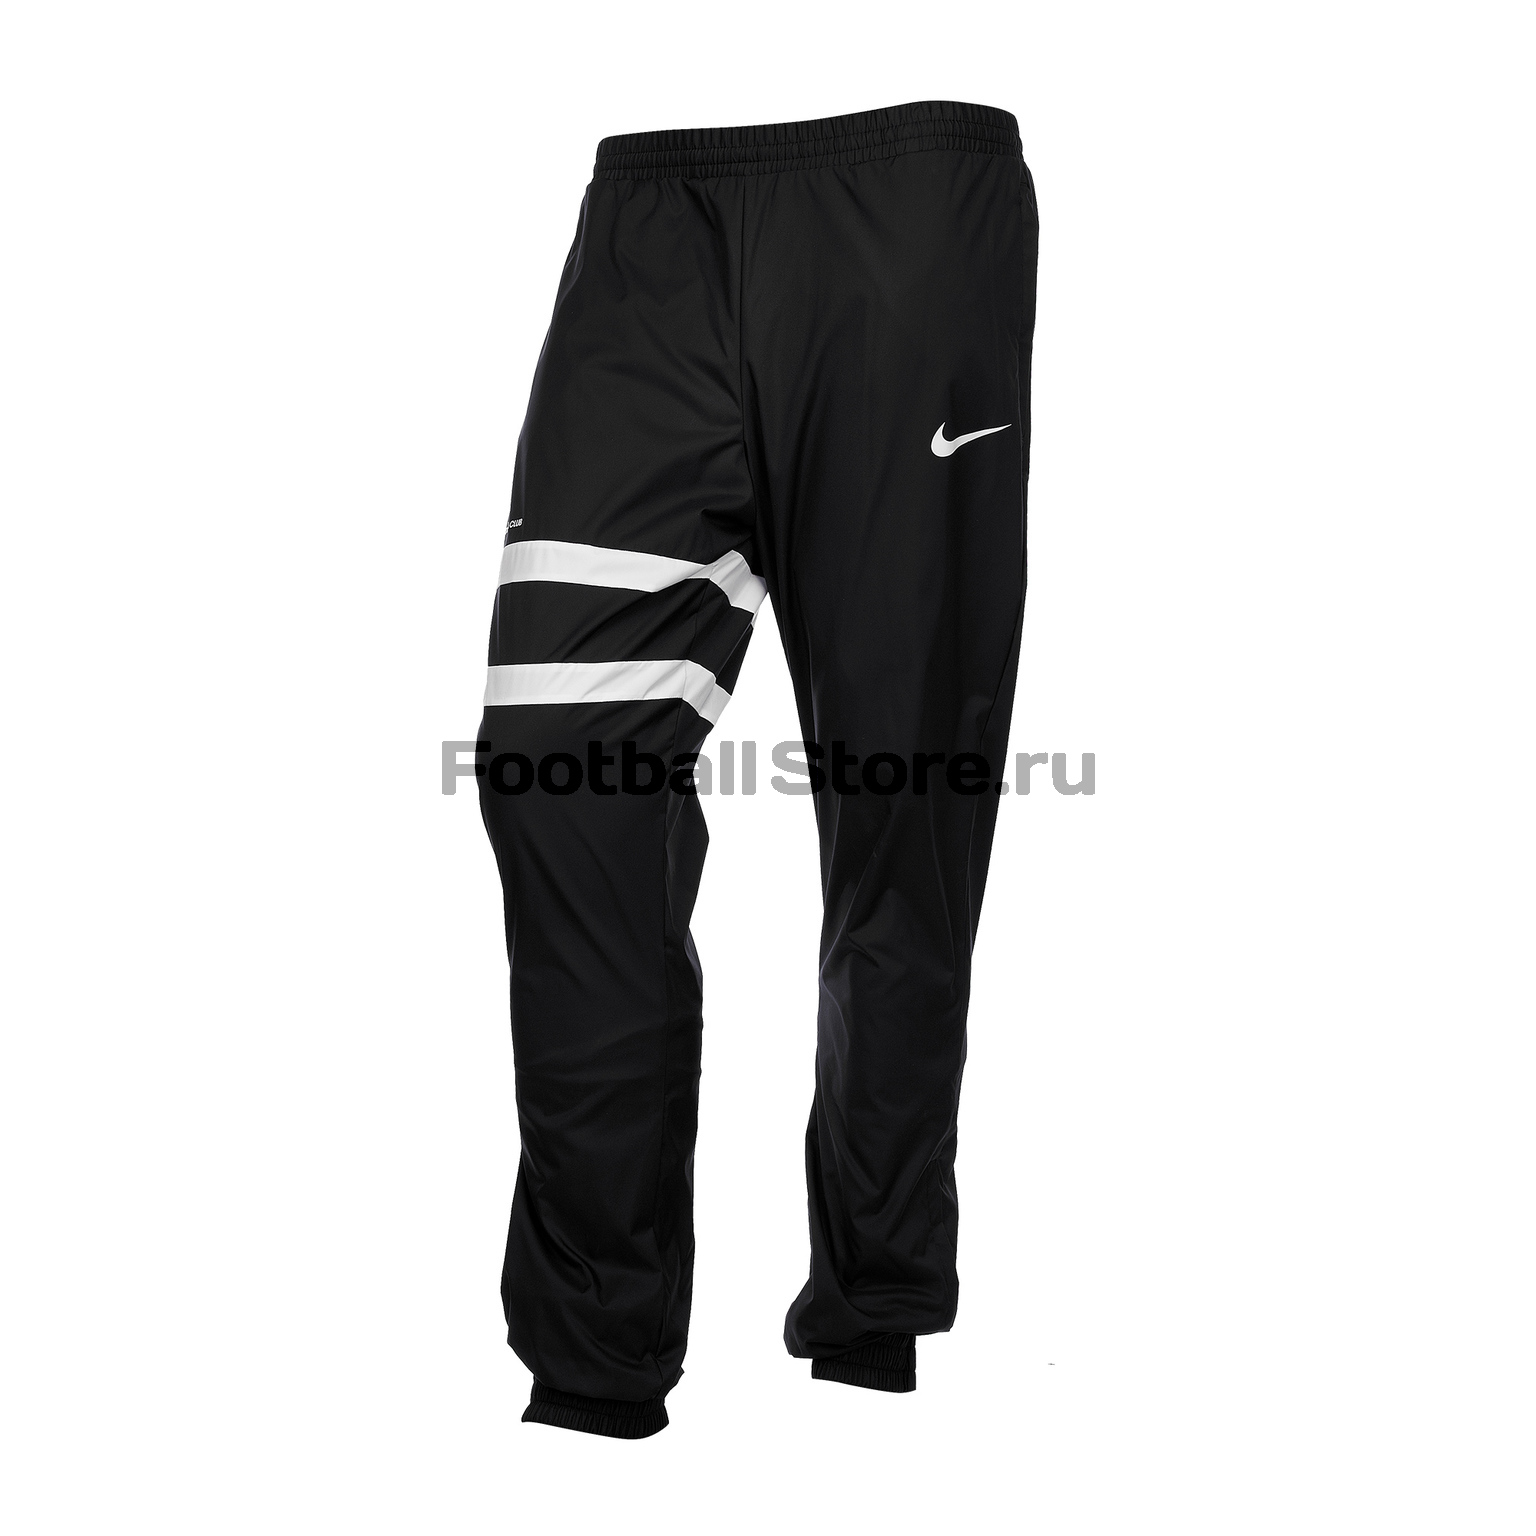 Брюки Nike F.C. Pant AQ1277-010 nike nike found 12 poly pant boys 476747 010